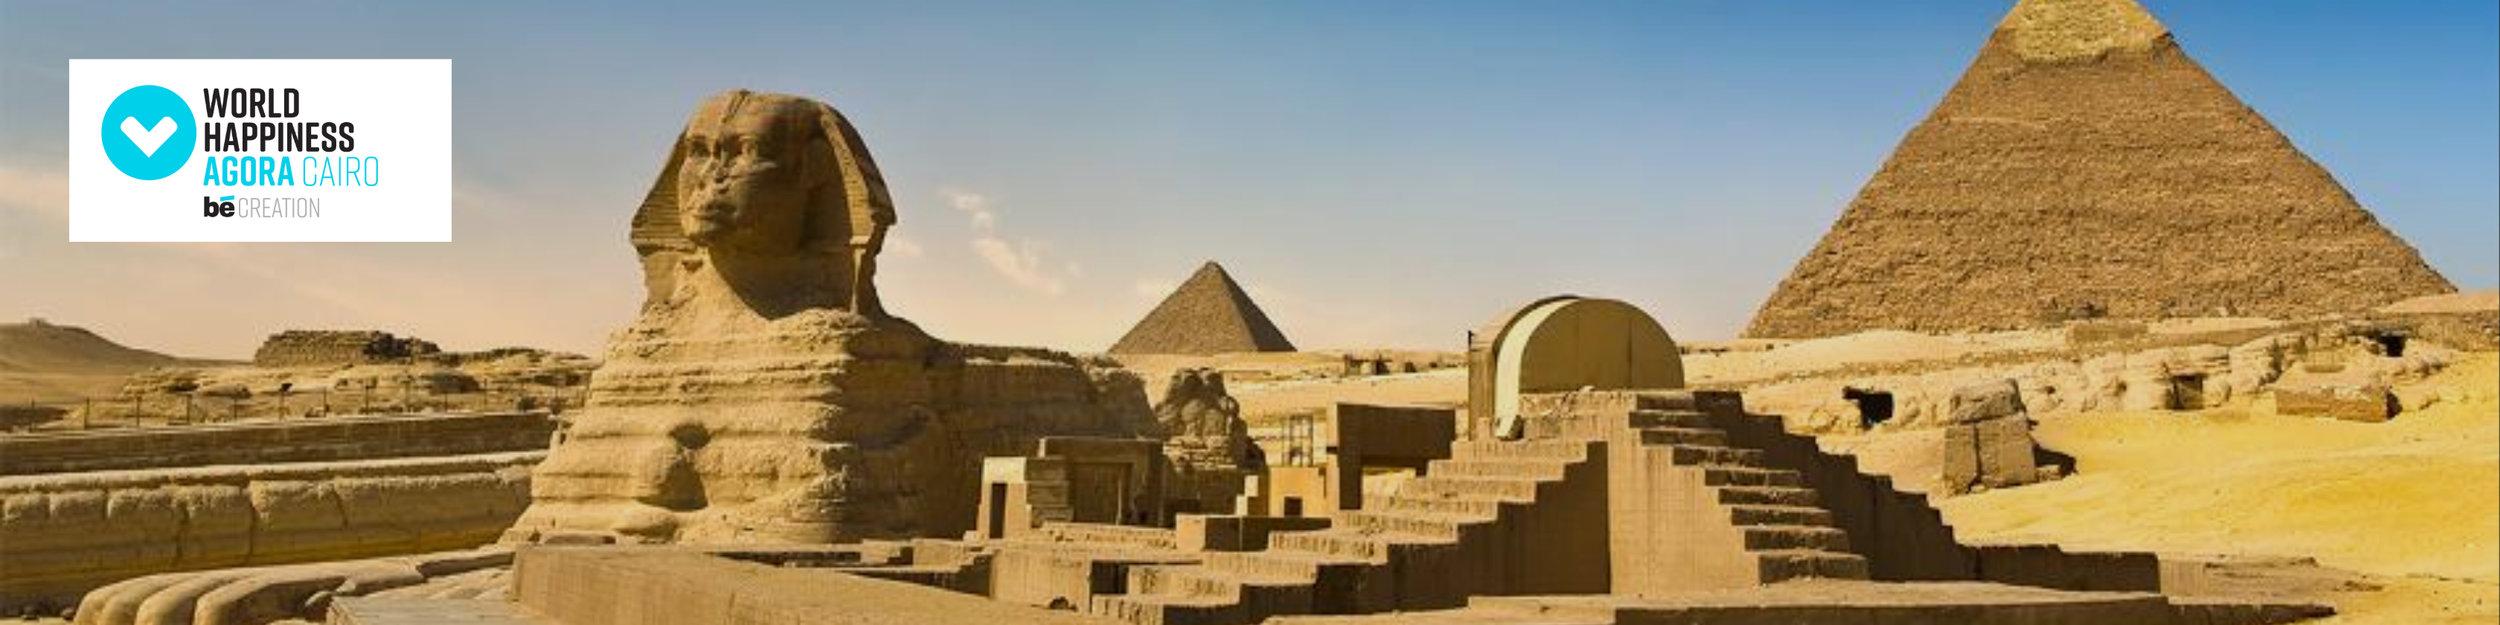 World Happiness Agora - Cairo - Egypt